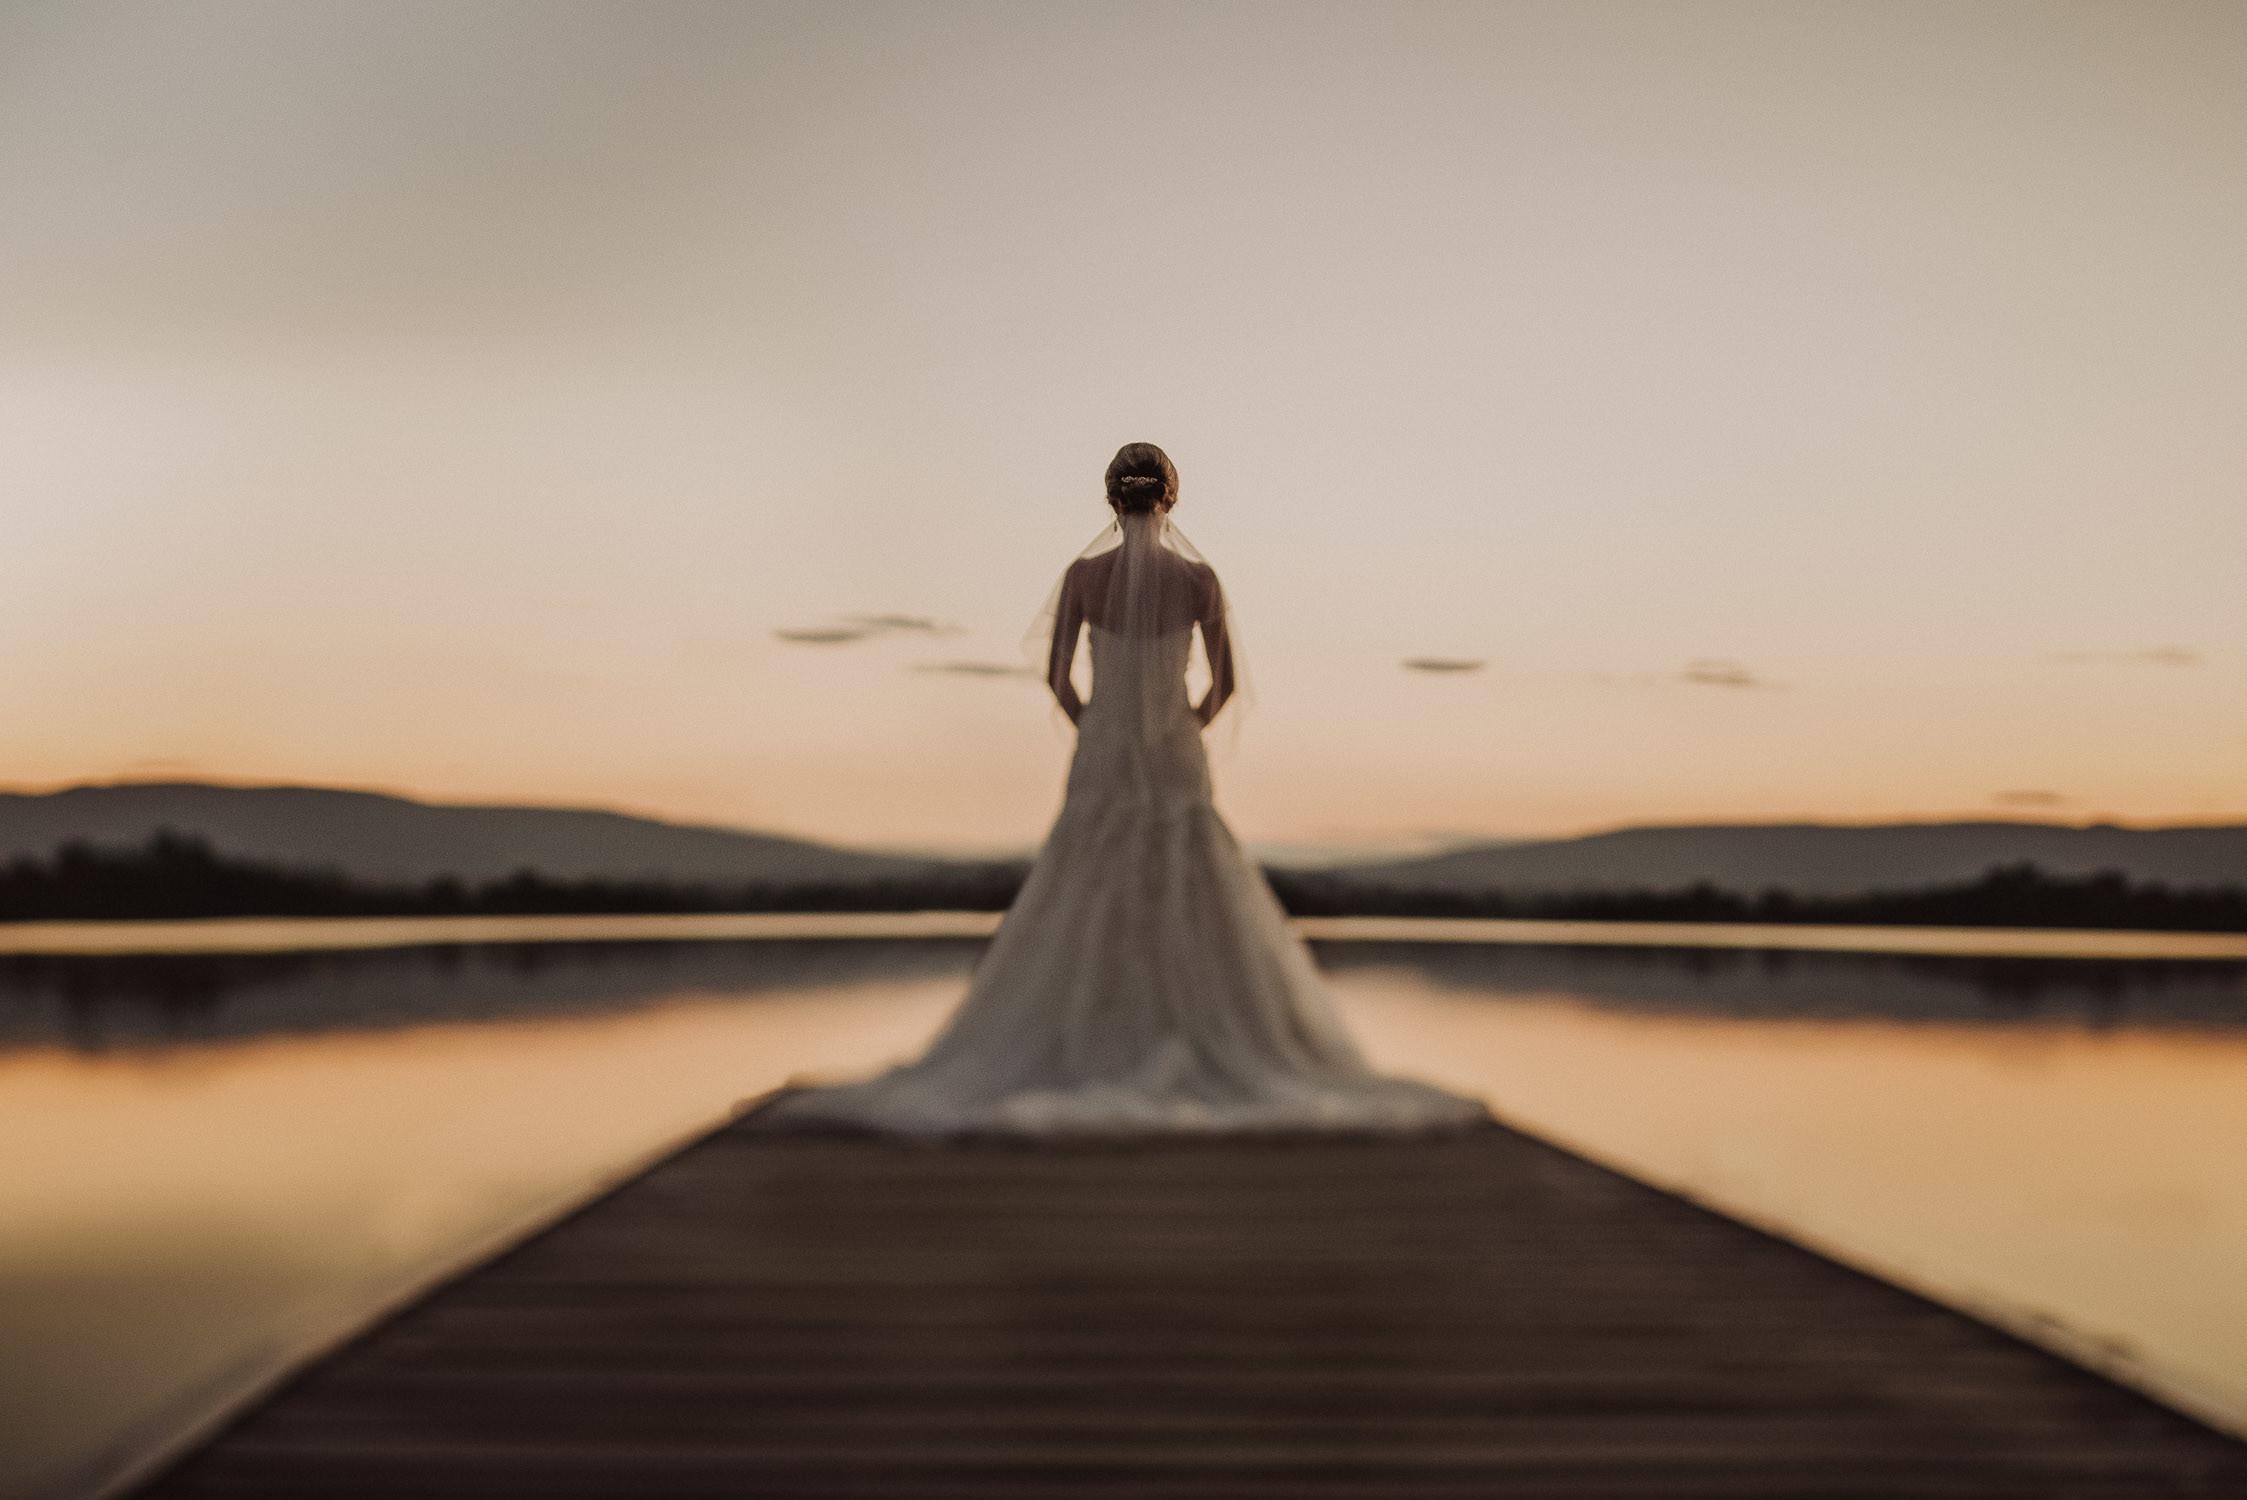 destination wedding photographer Markus Husner